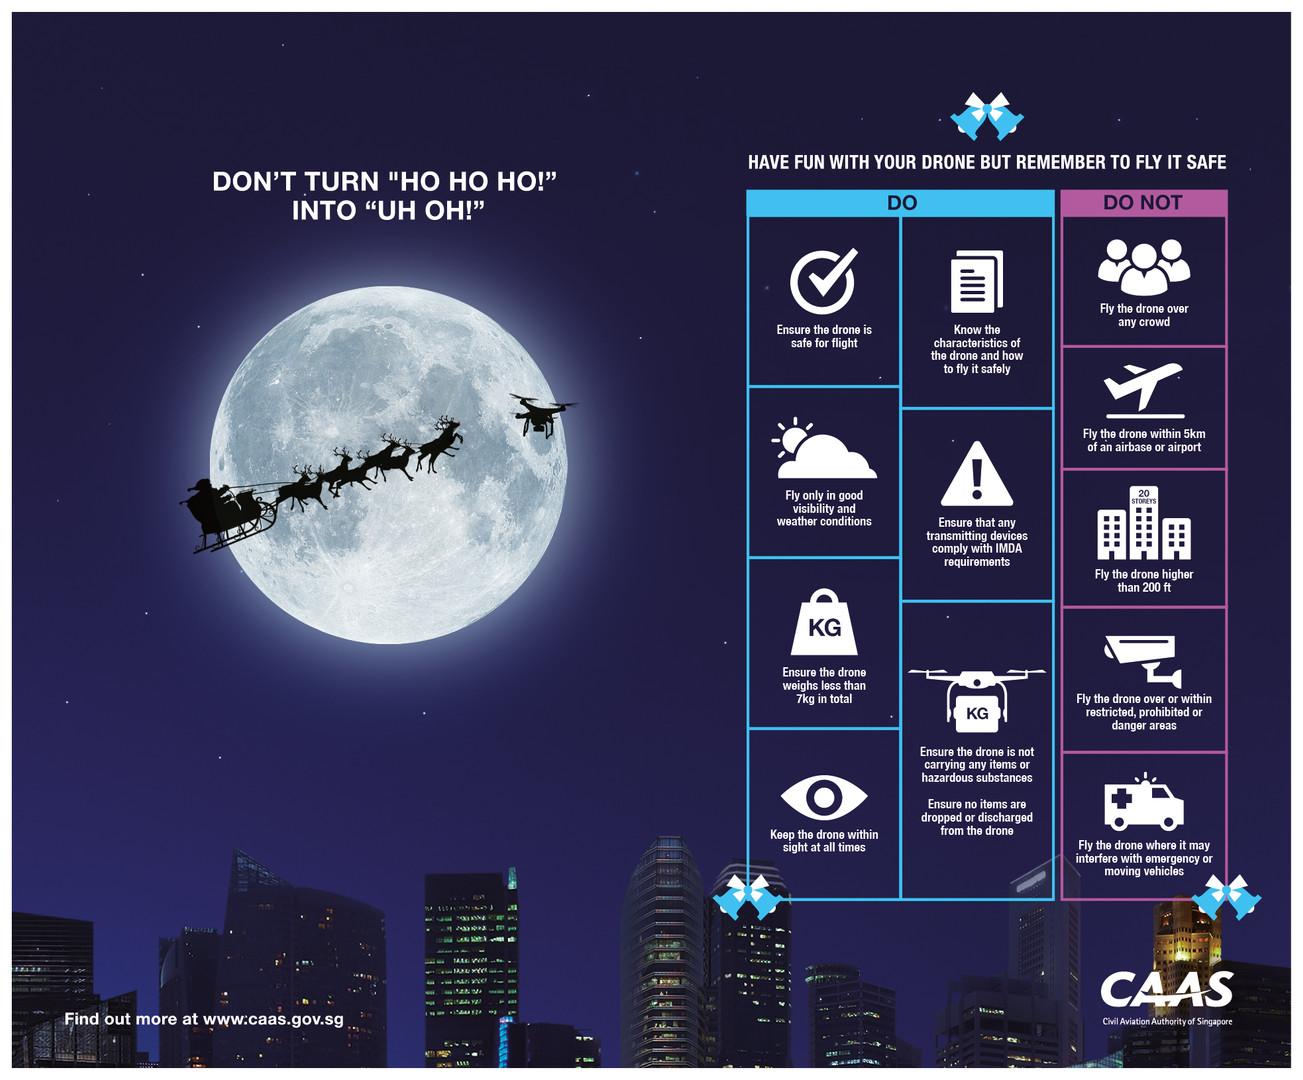 CAAS_santa_drone-06.jpg